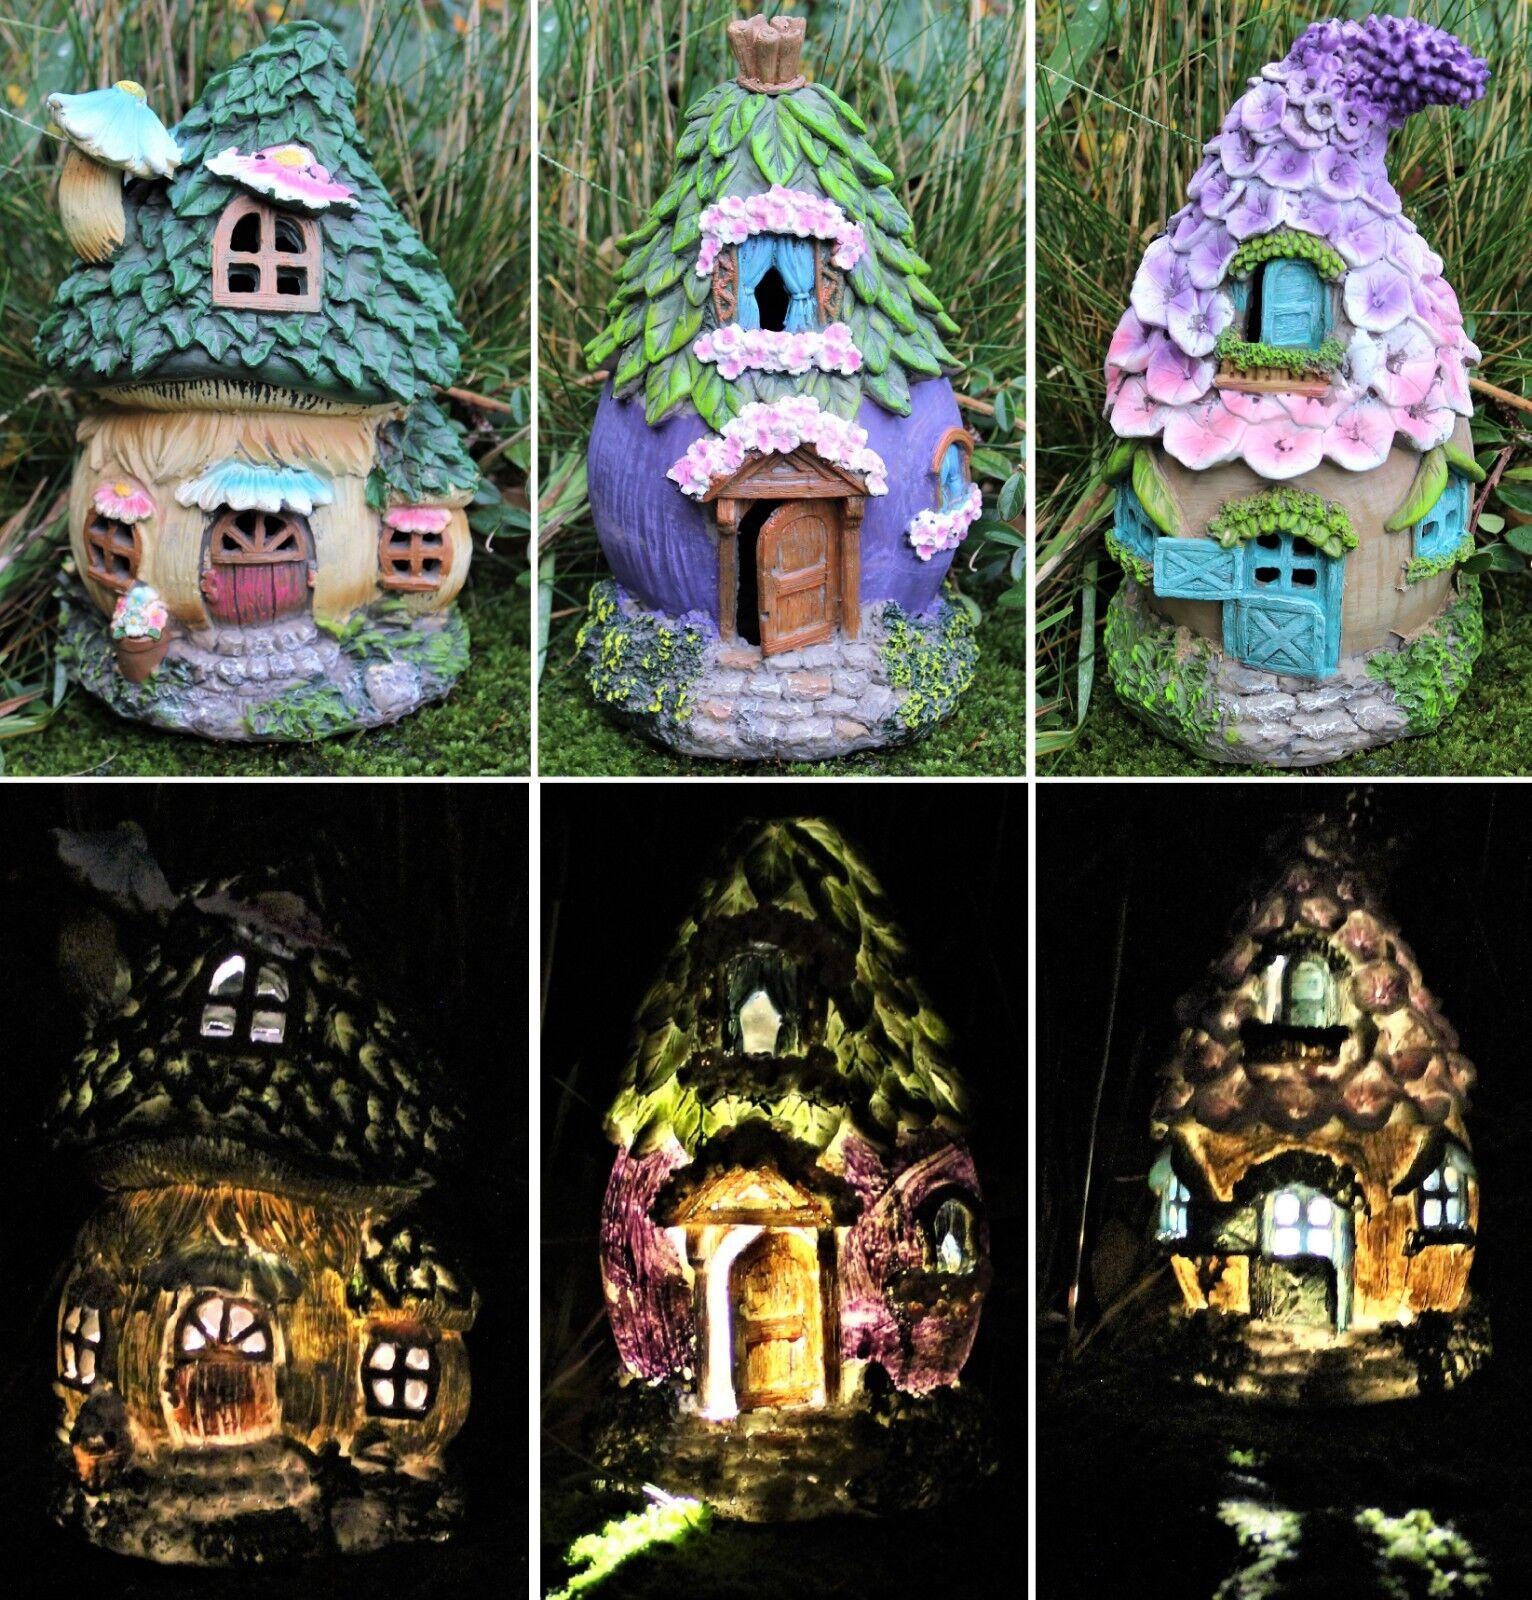 Fairy House Solar Garden Ornament Pixie Lawn Secret Gift £12.95 @ eBay